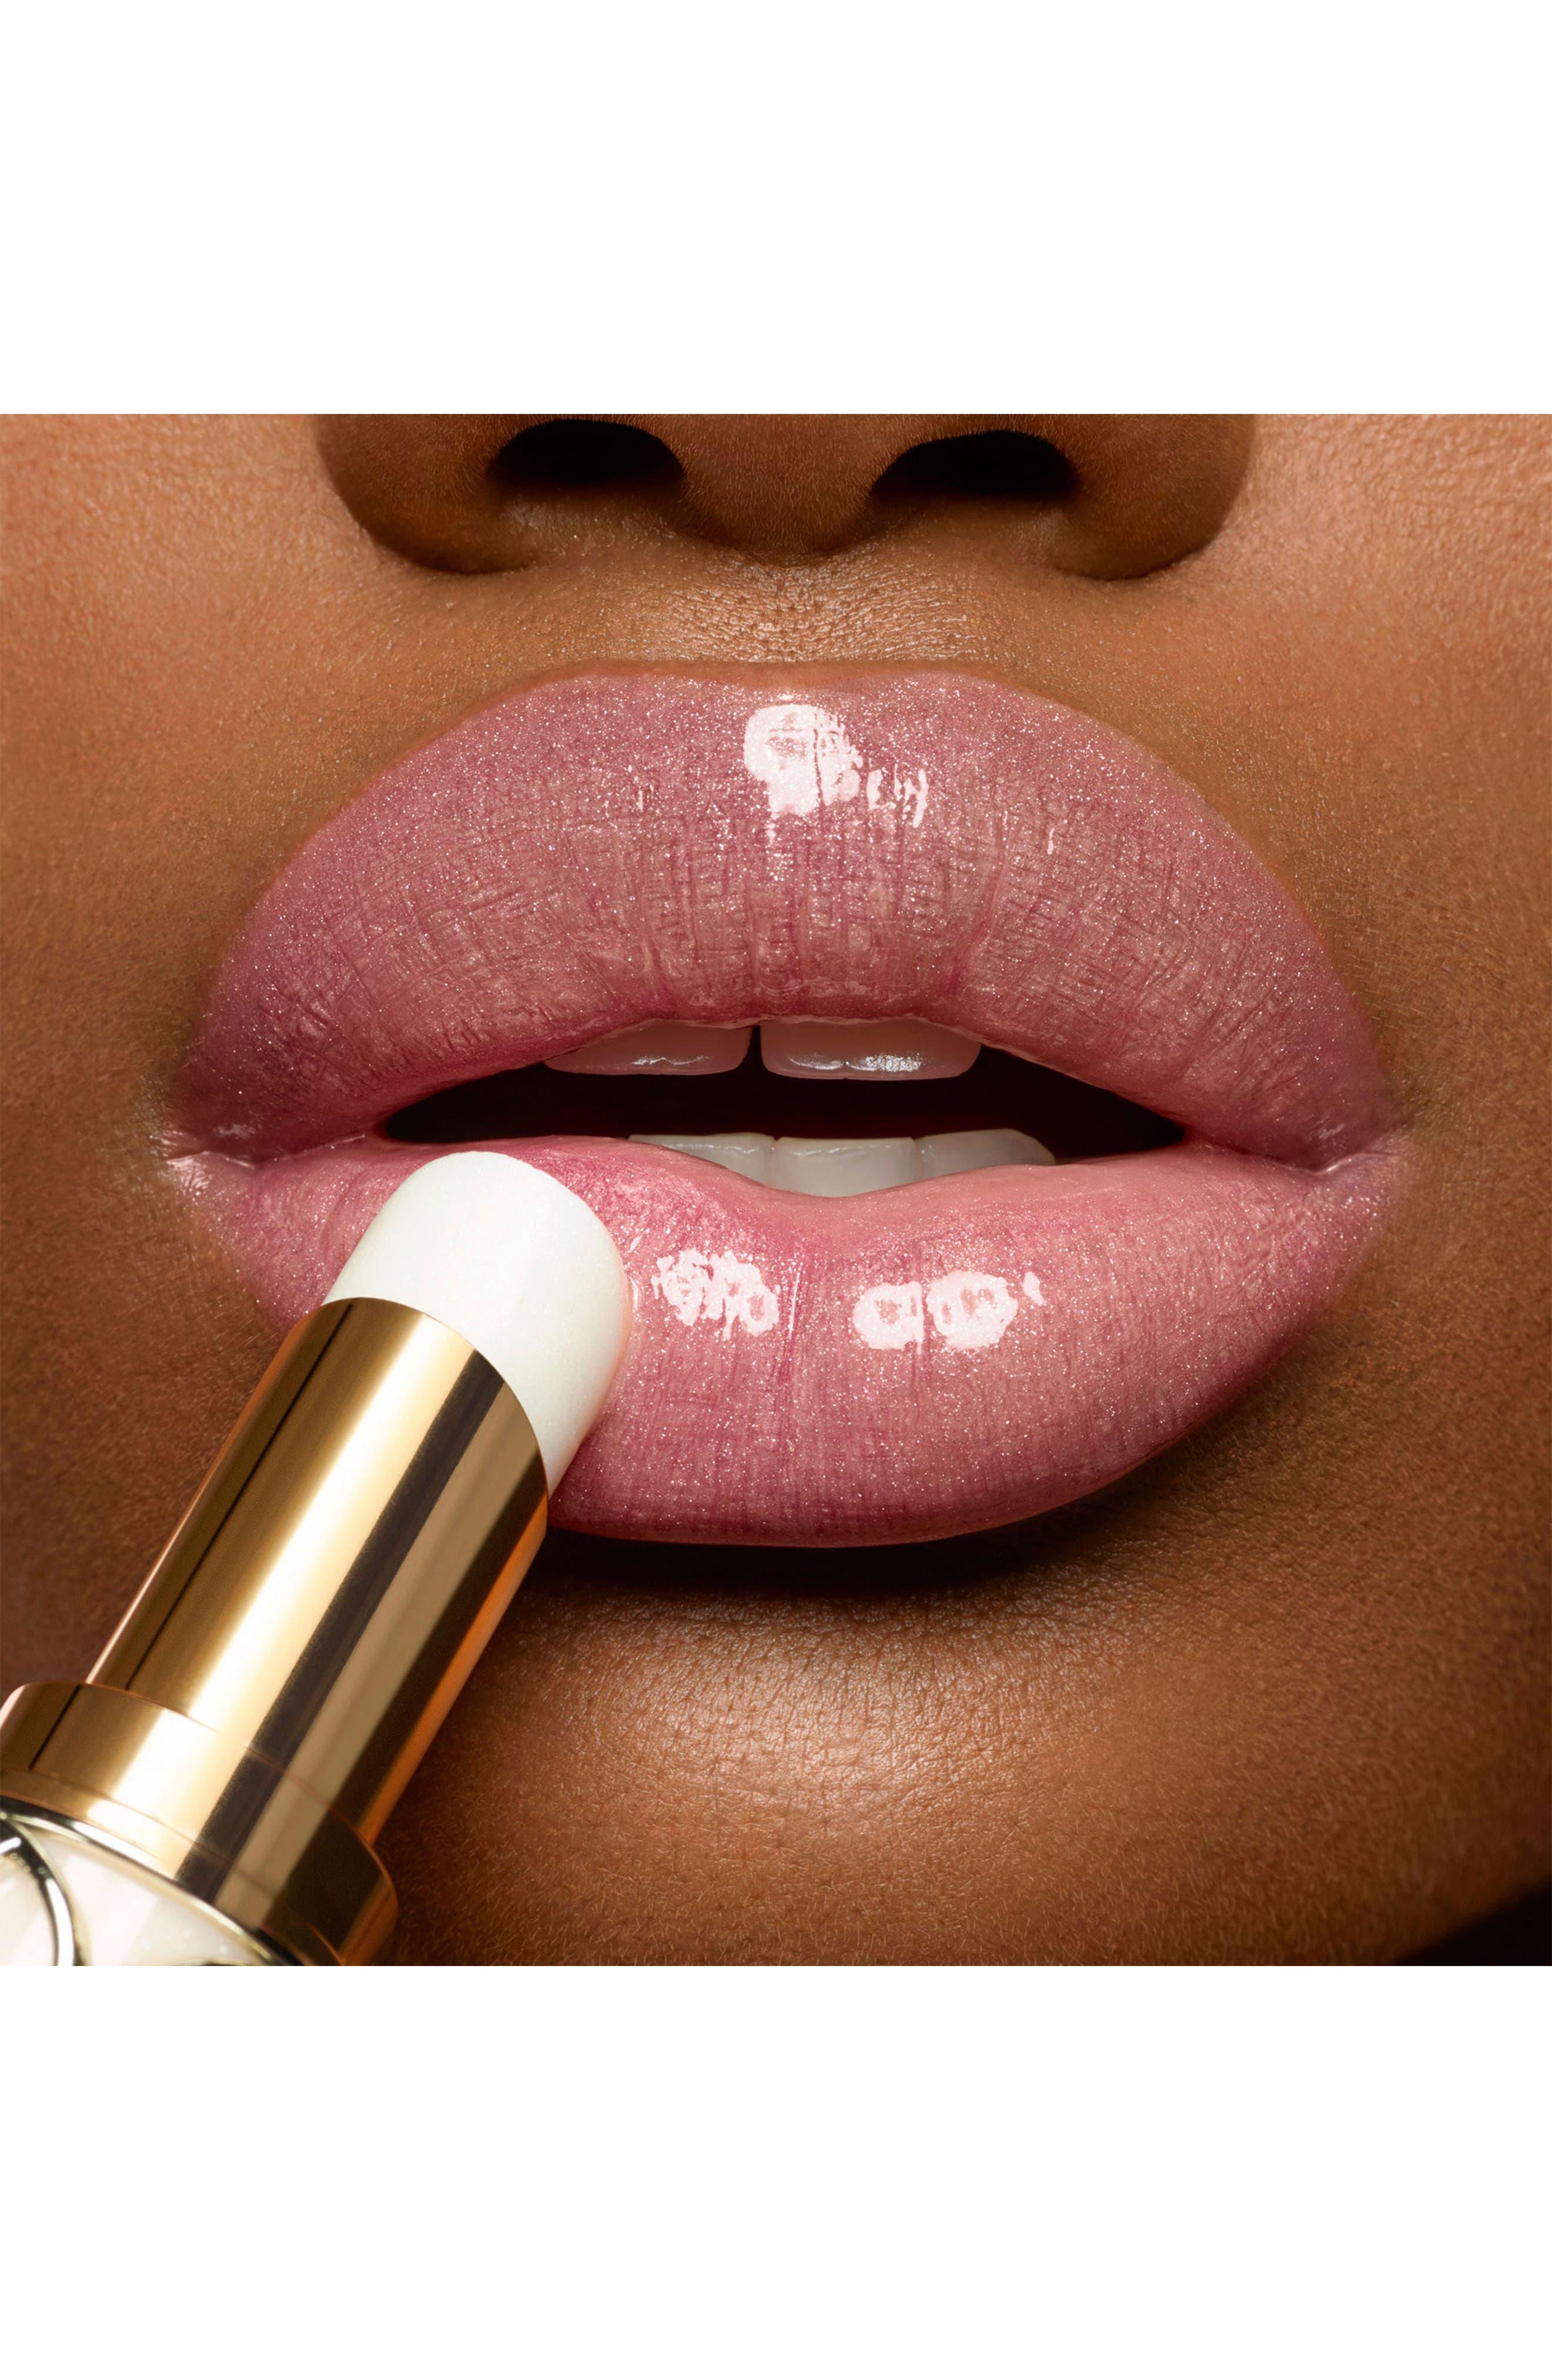 Rouge Volupté Shine Oil-in-Stick Lipstick,                             Alternate thumbnail 4, color,                             42 BAUME MIDI MINUIT